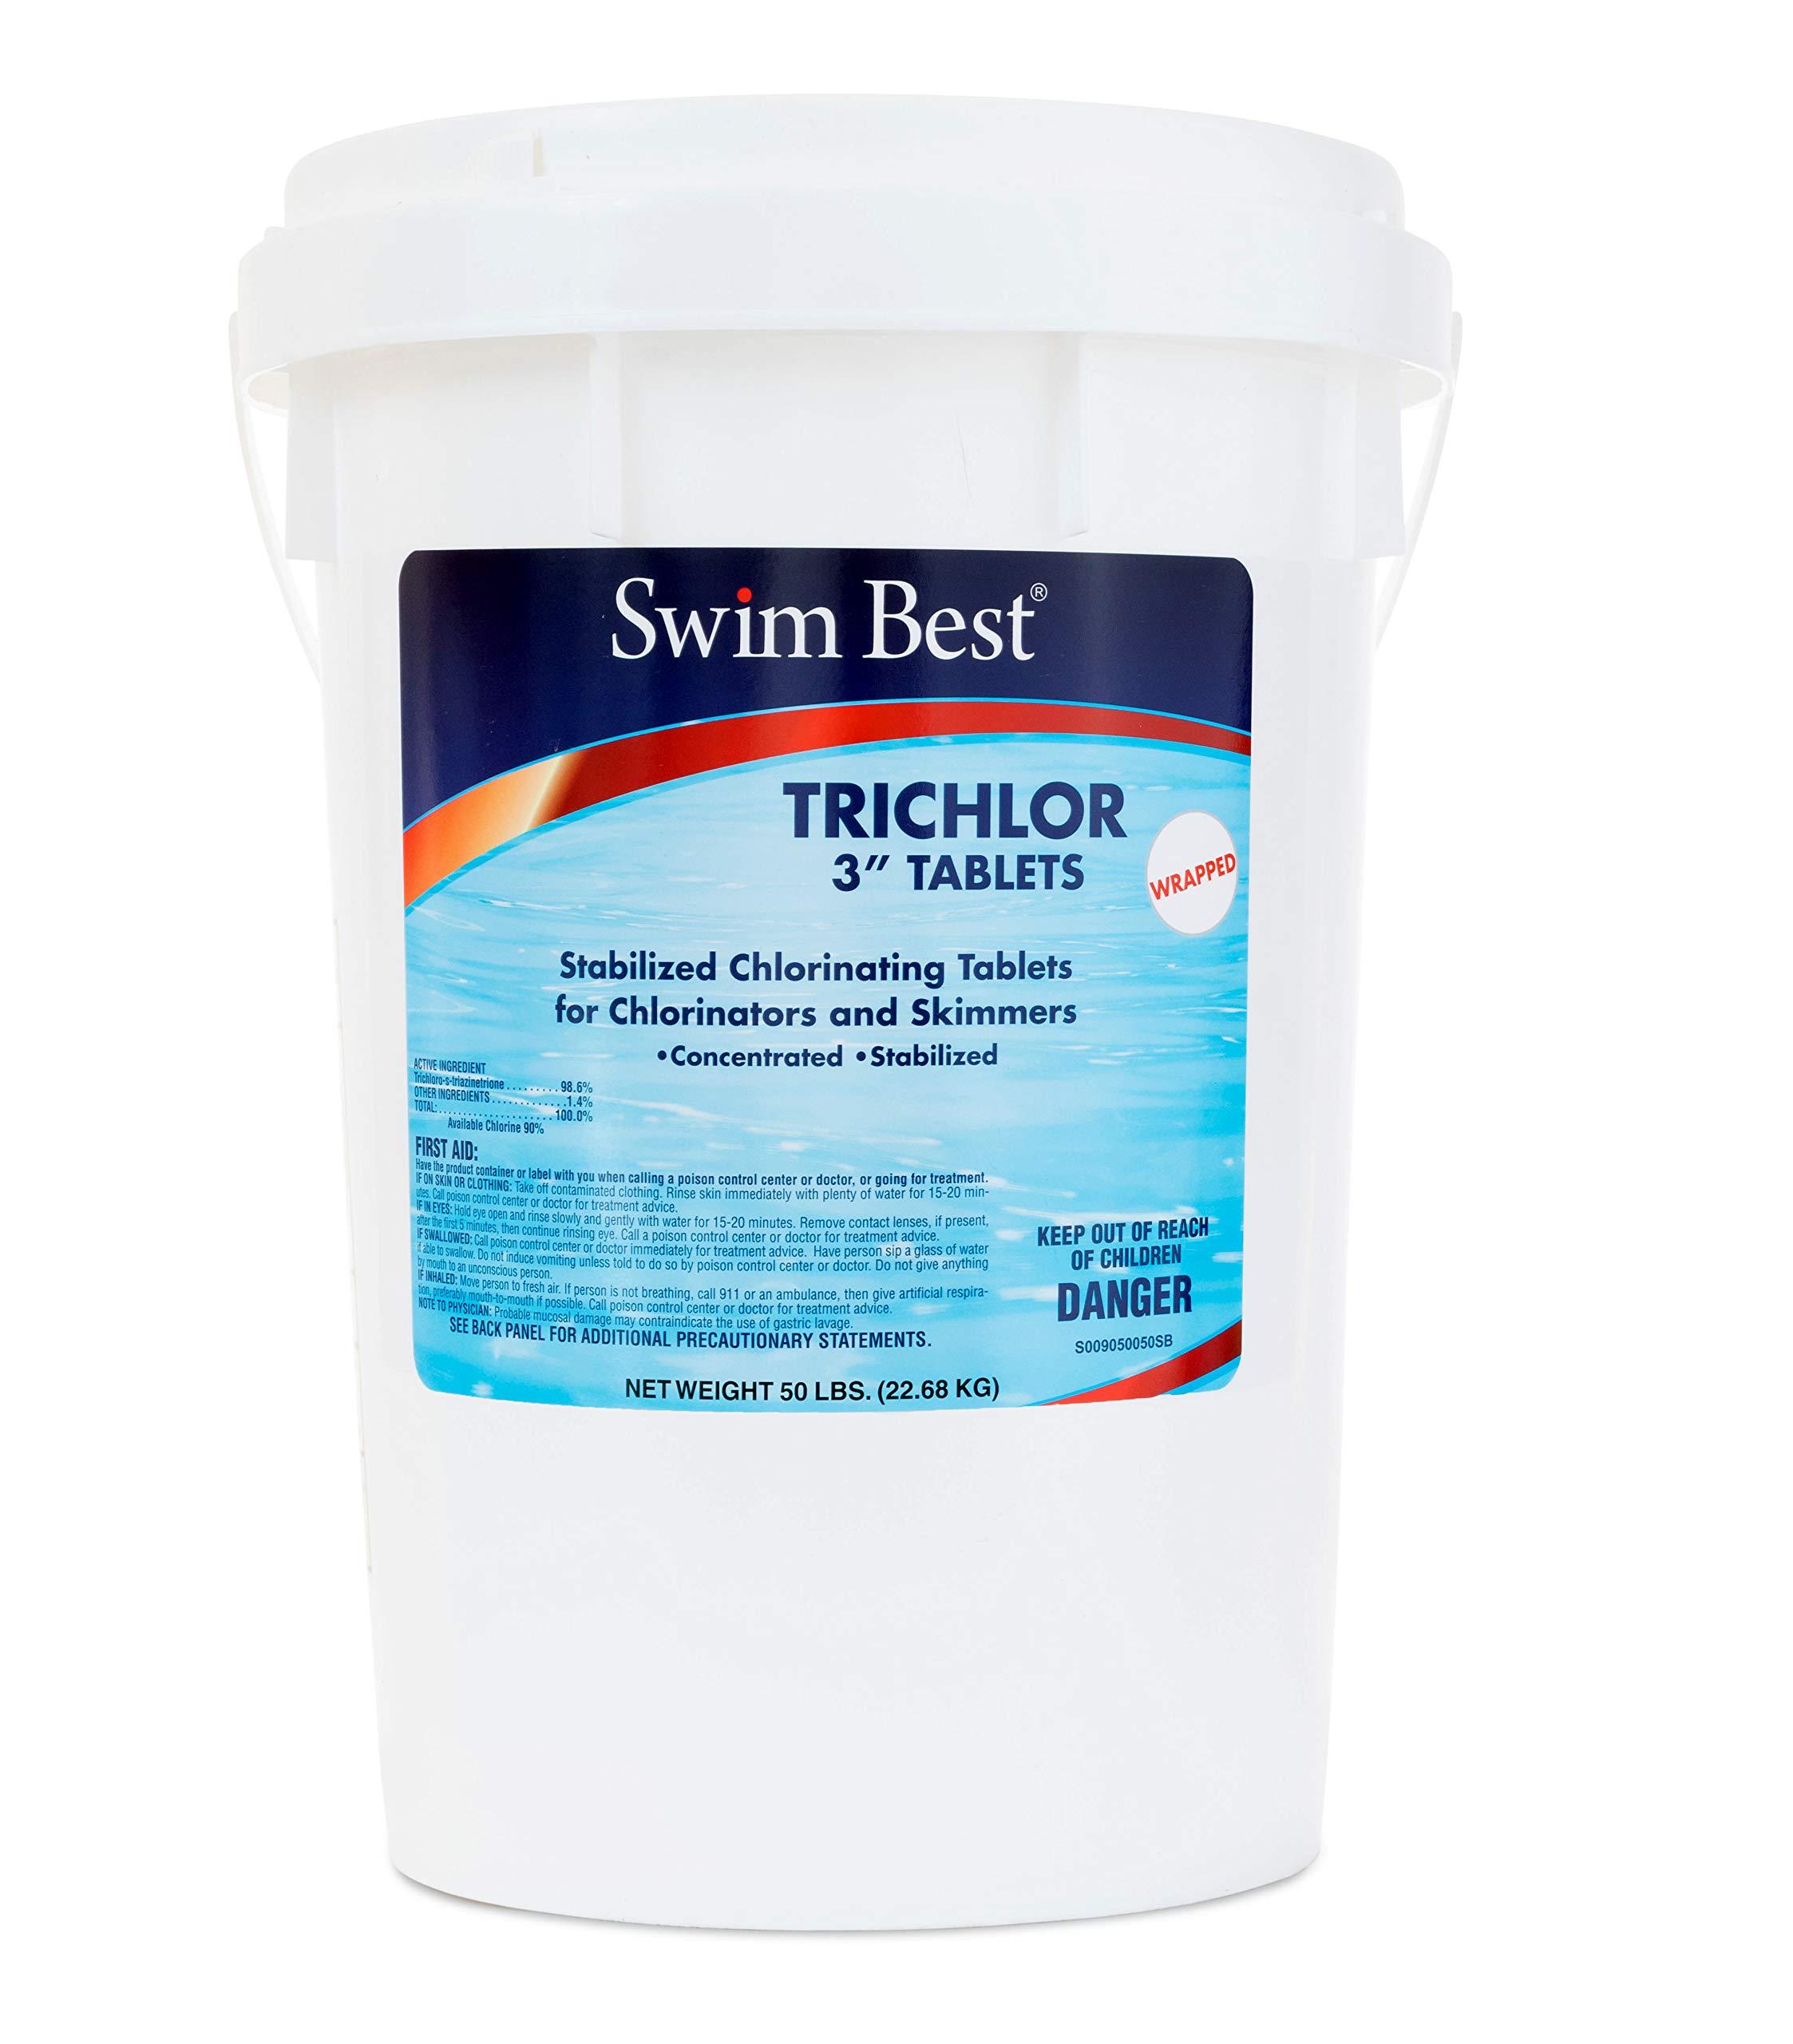 Swim Best U009050050 Swimming Pool Chlorine, 50 lbs by Swim Best